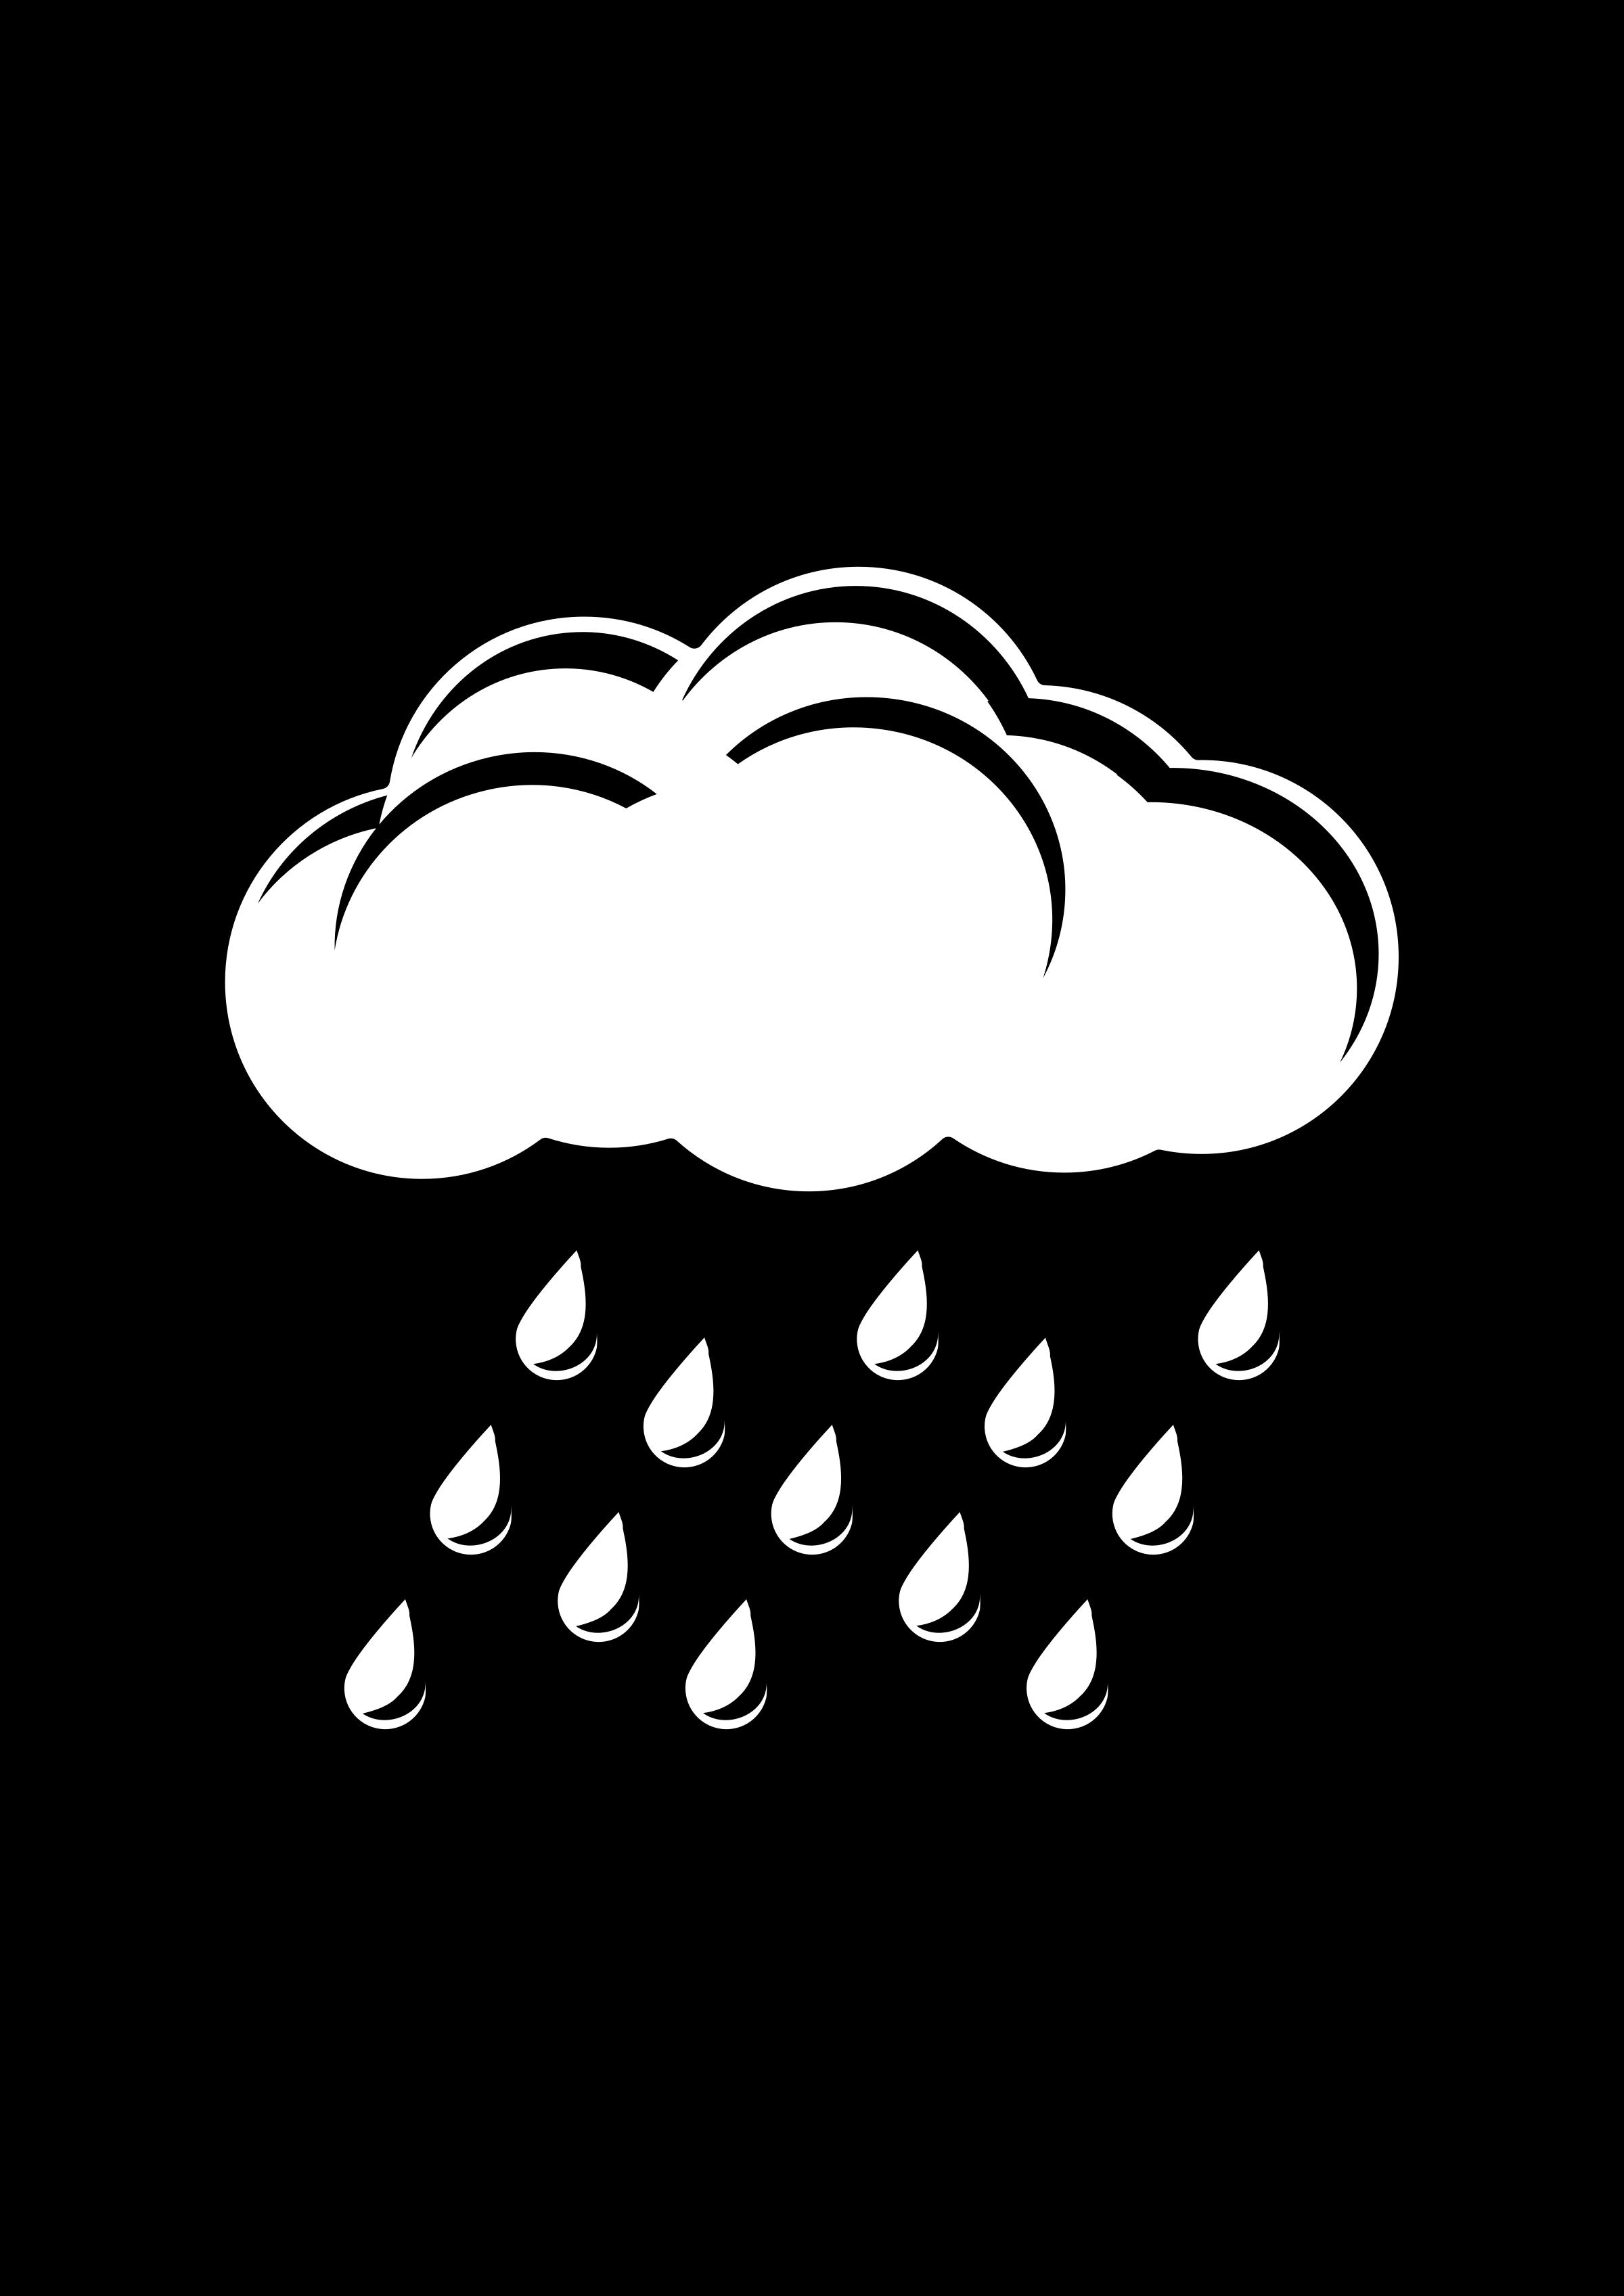 Drawn rain rain cloud 59 Rain clipart rain clipartoons